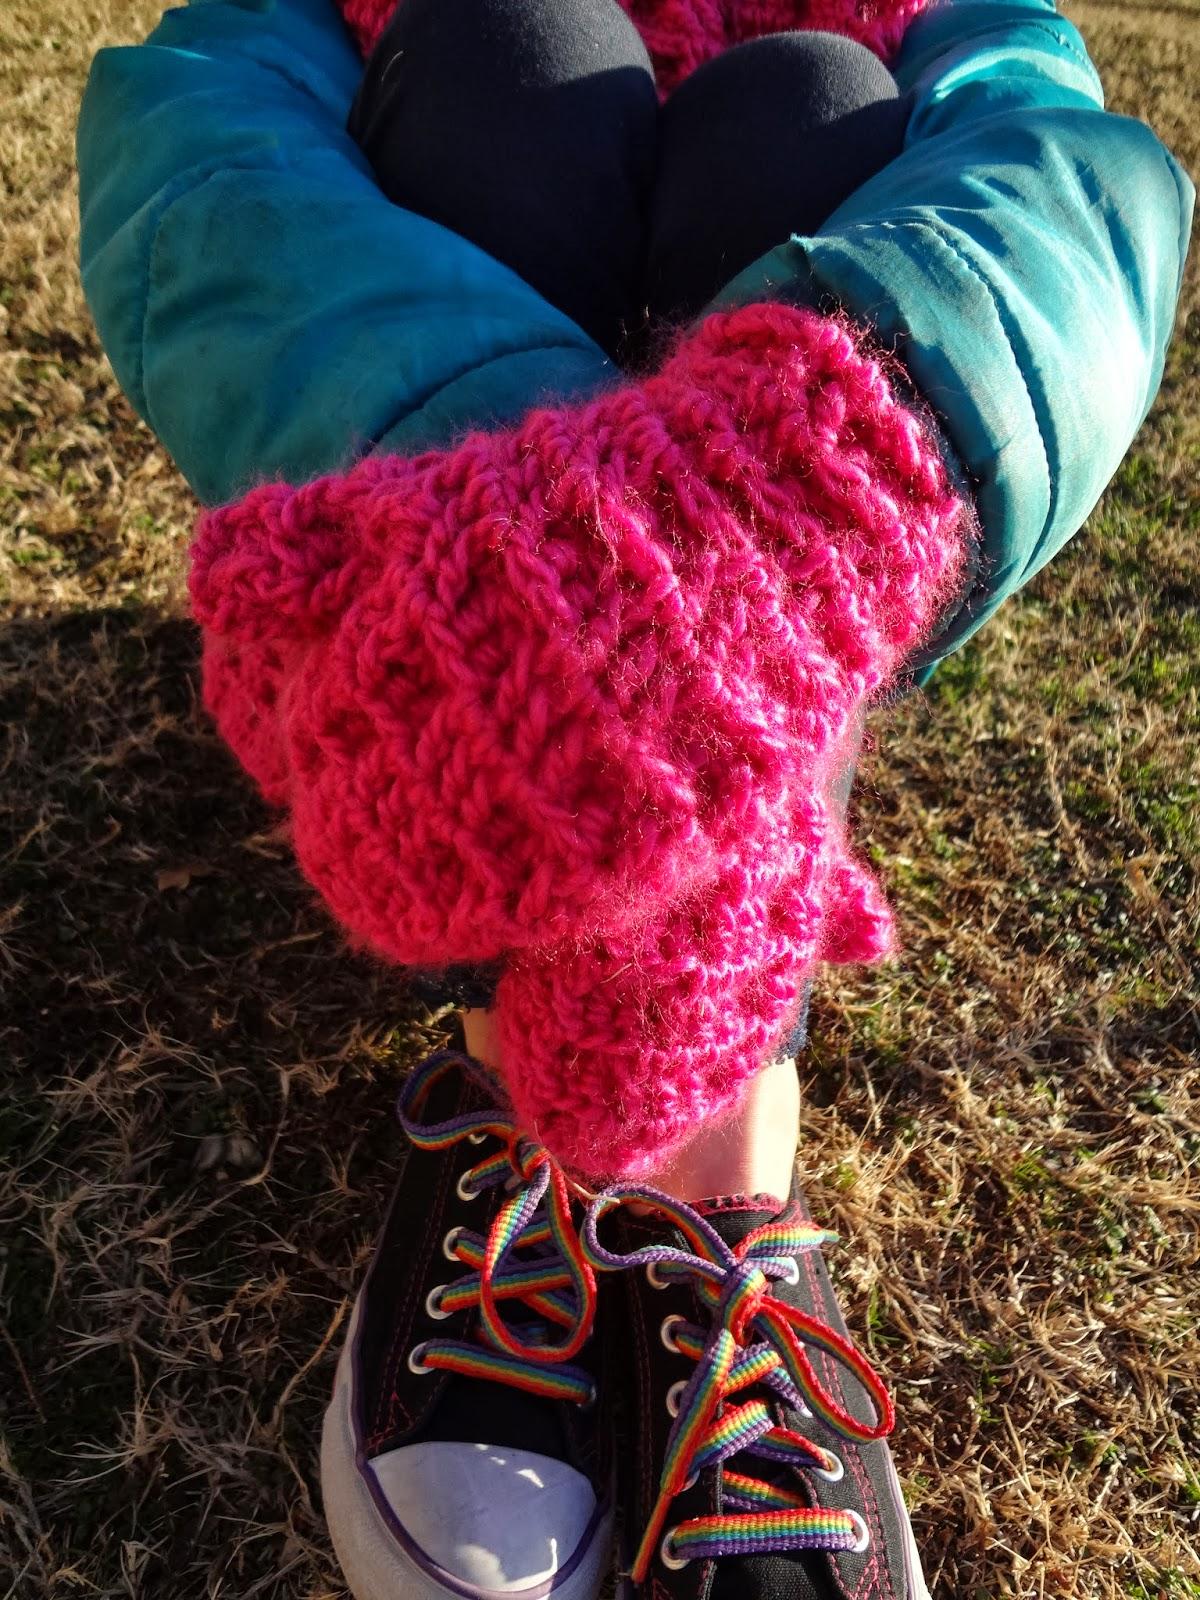 Crochet mittens in waffle stitch. Free crochet pattern from Banana Moon Studio.